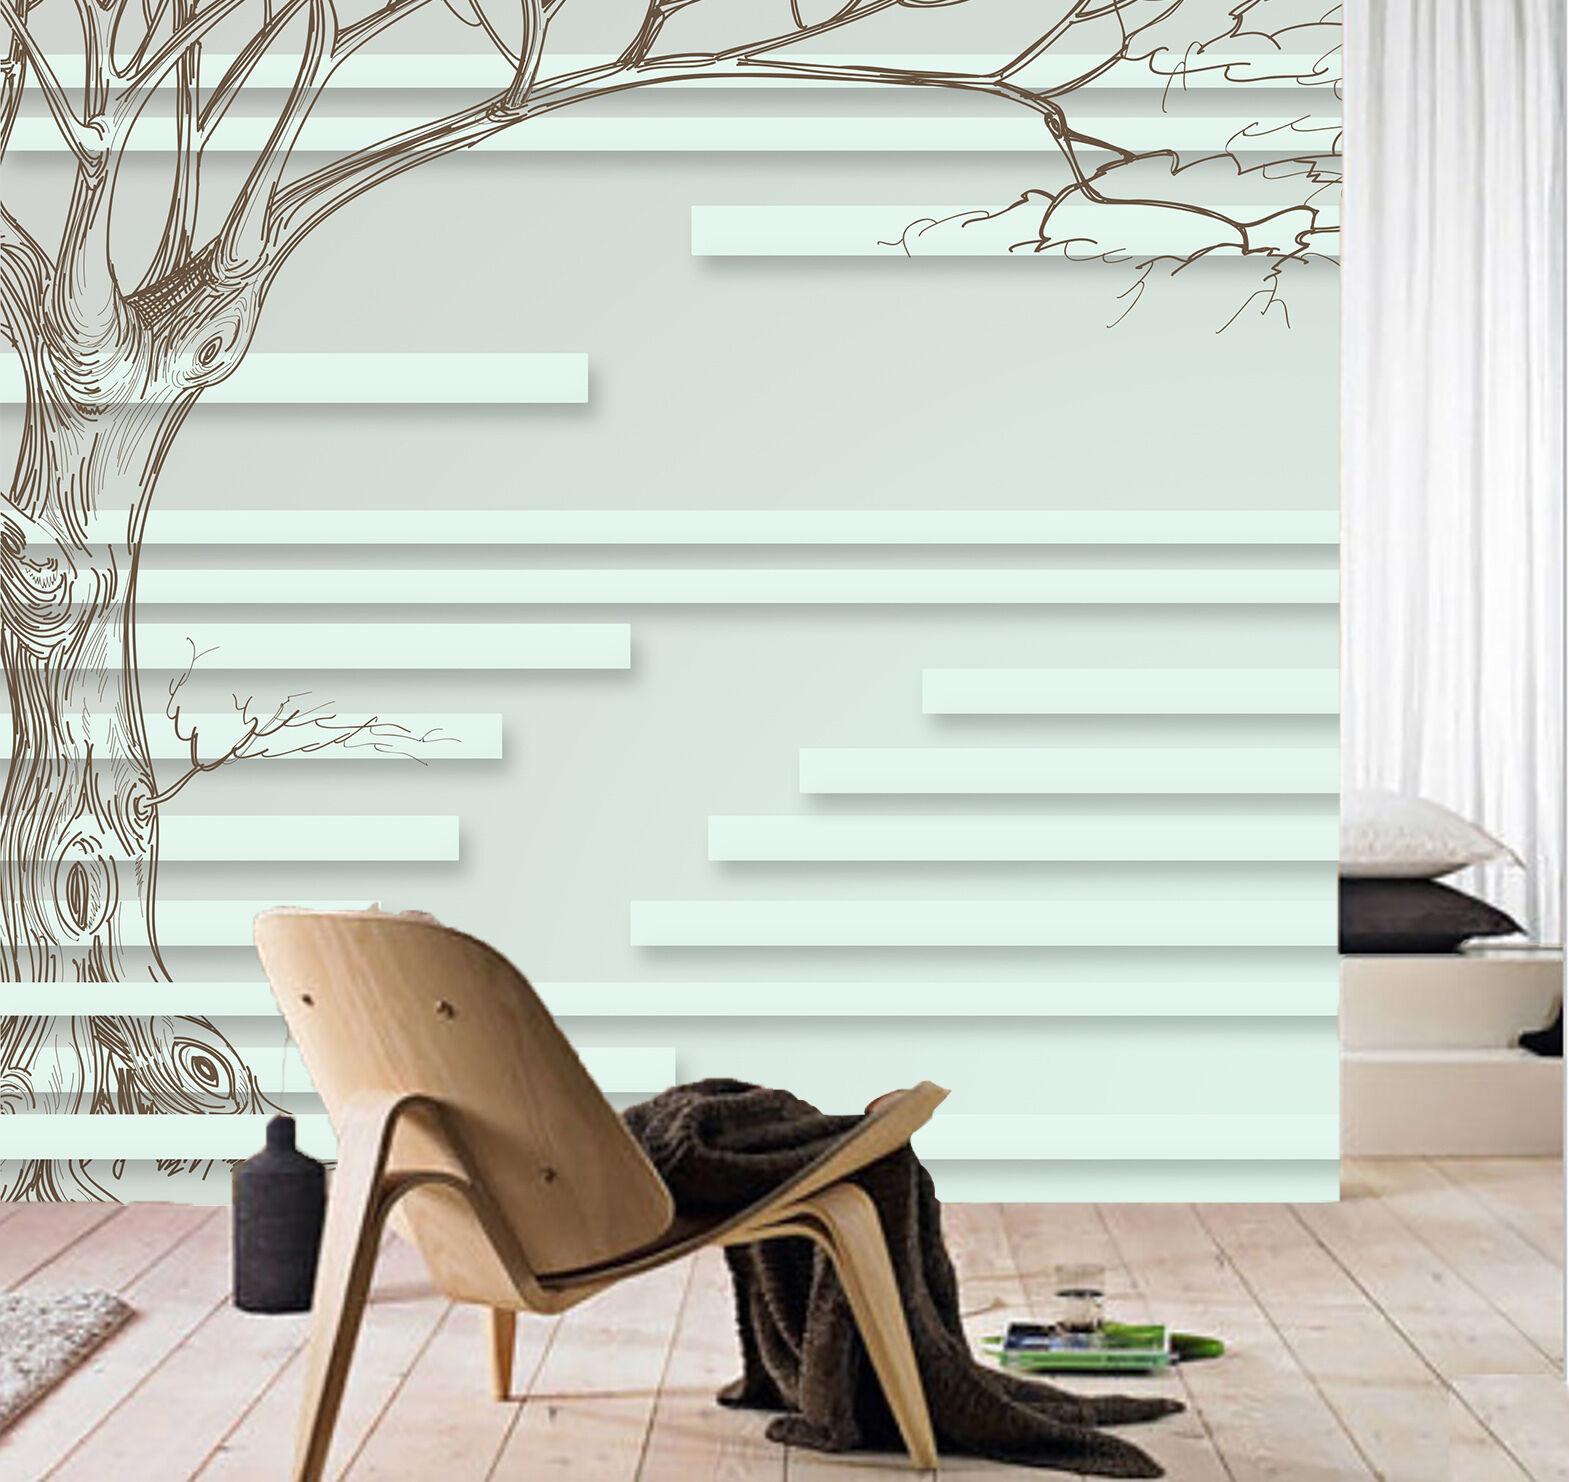 3D Tronco Alber 4 Parete Murale Foto Carta da parati immagine sfondo muro stampa